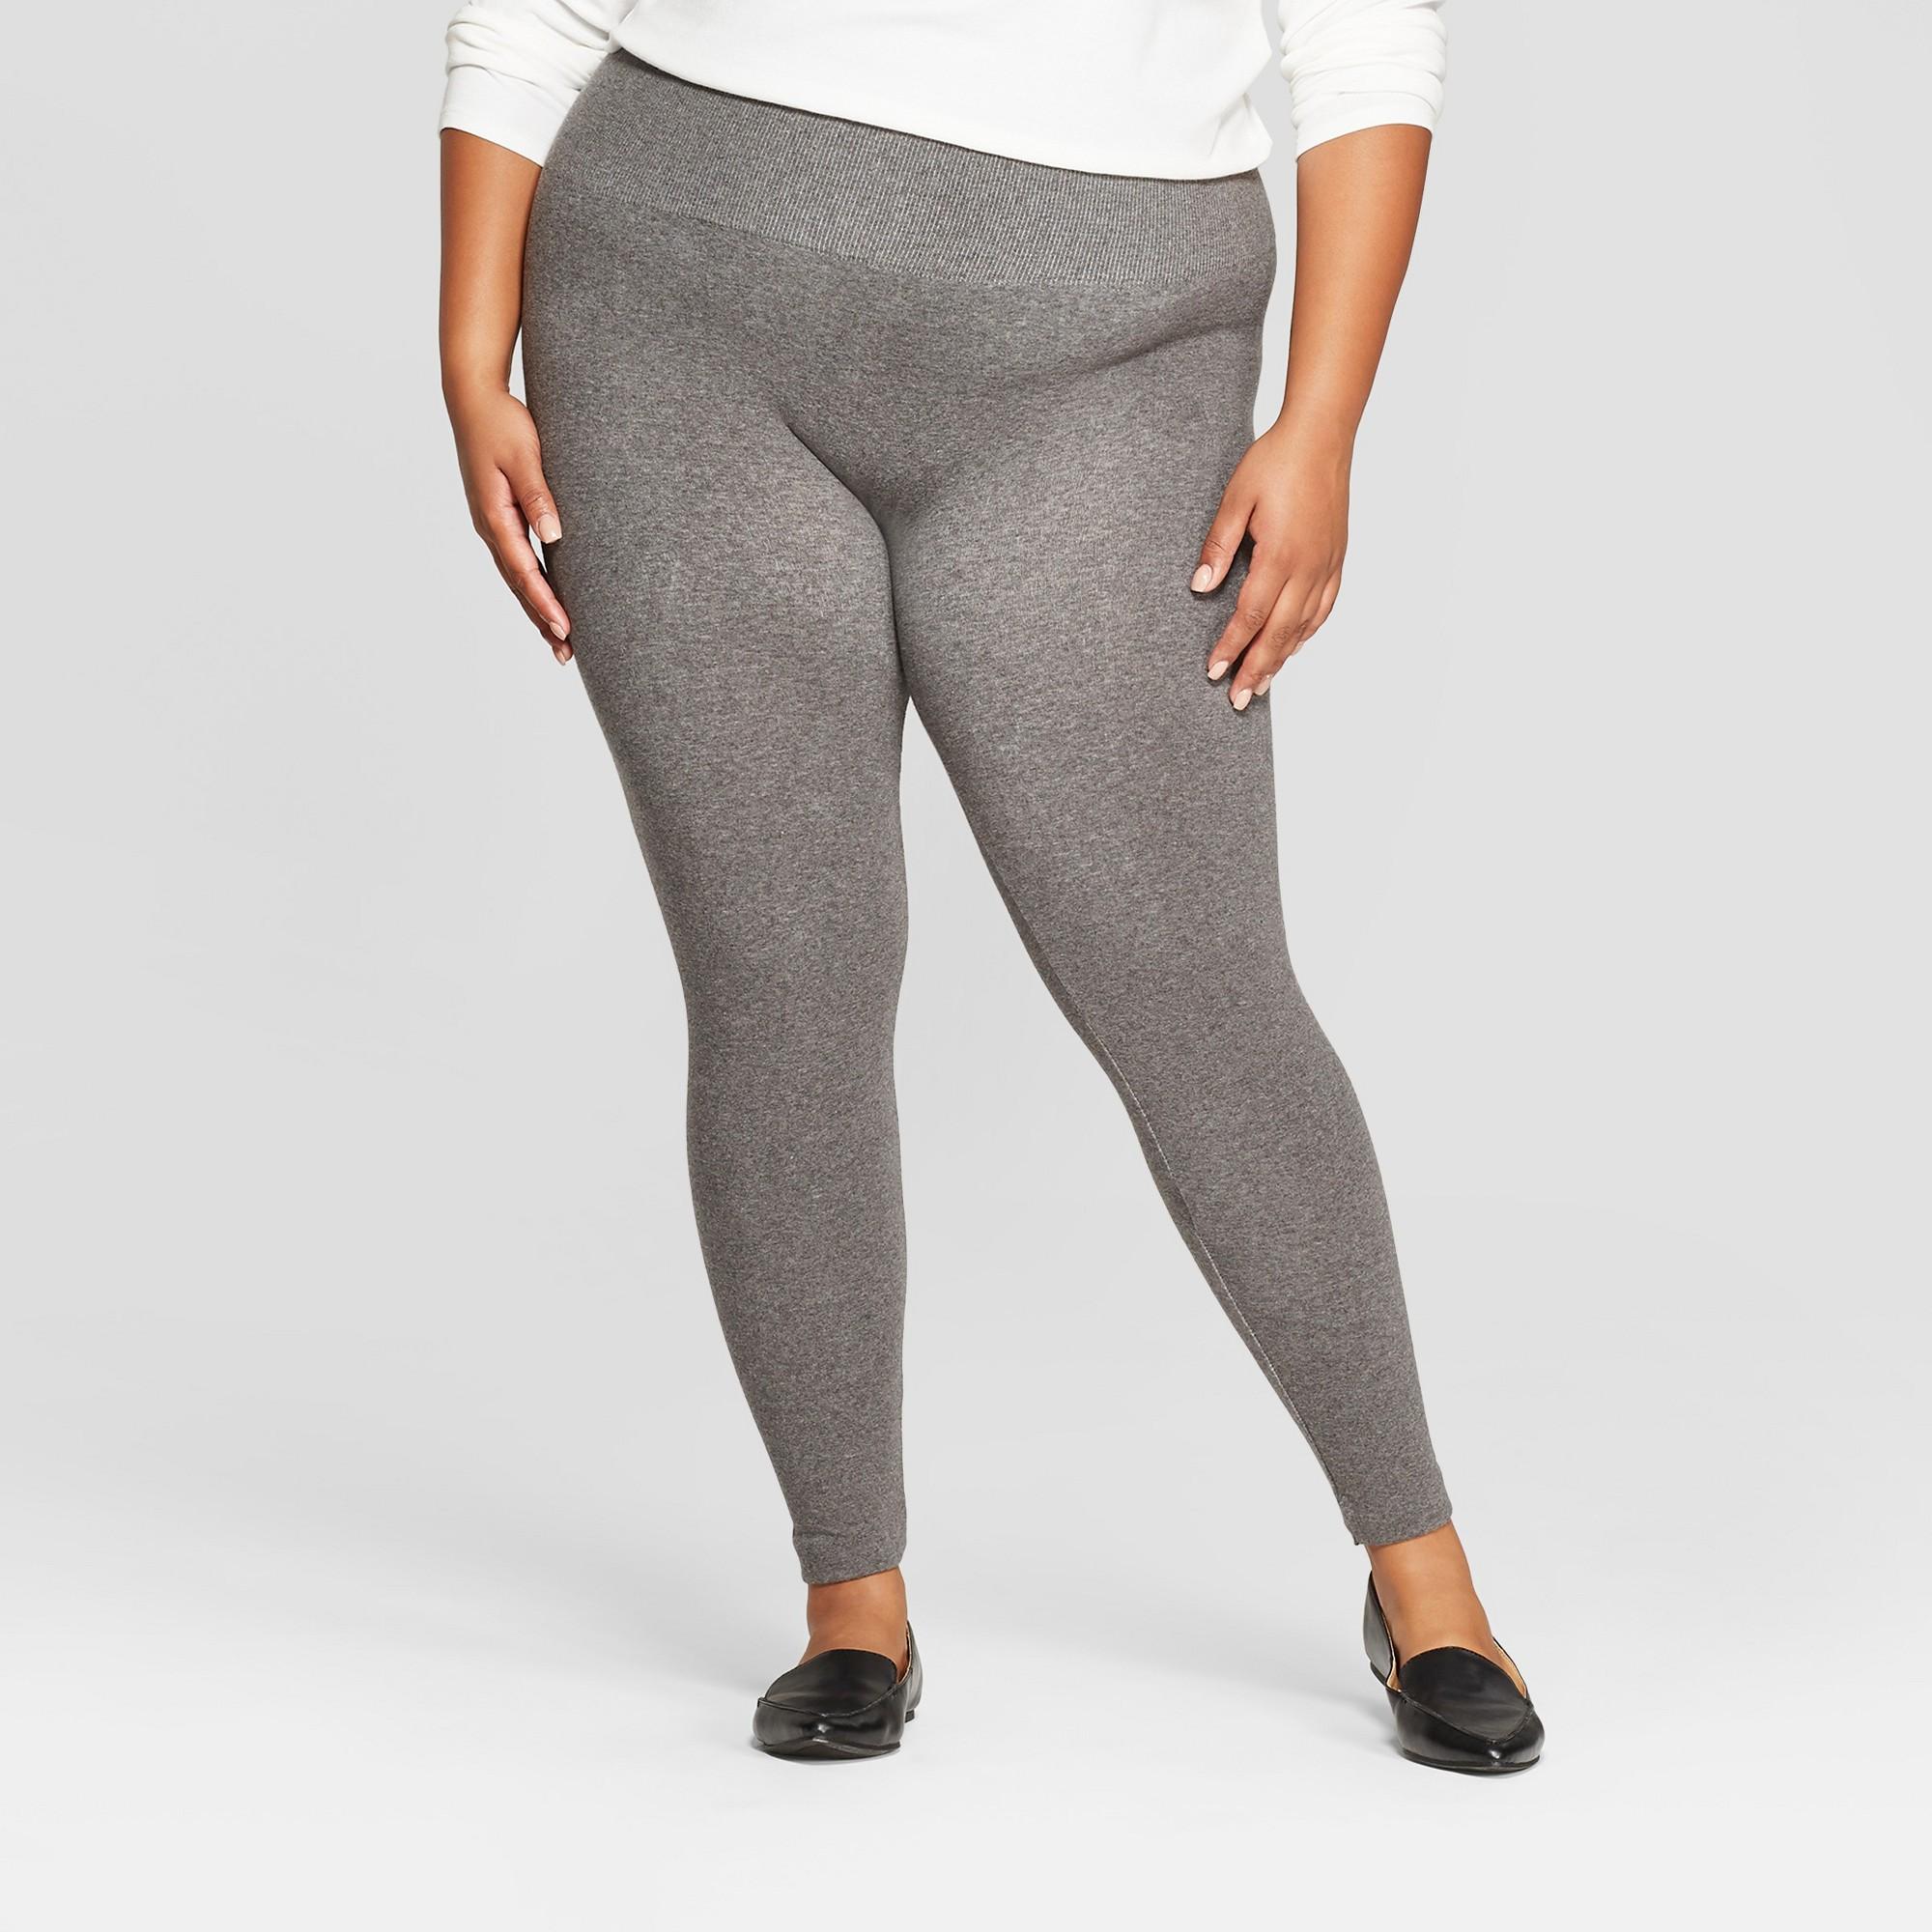 ddba0e99a030bf Women's Seamless Fleece Lined Leggings - A New Day™ Heather Gray 1X ...